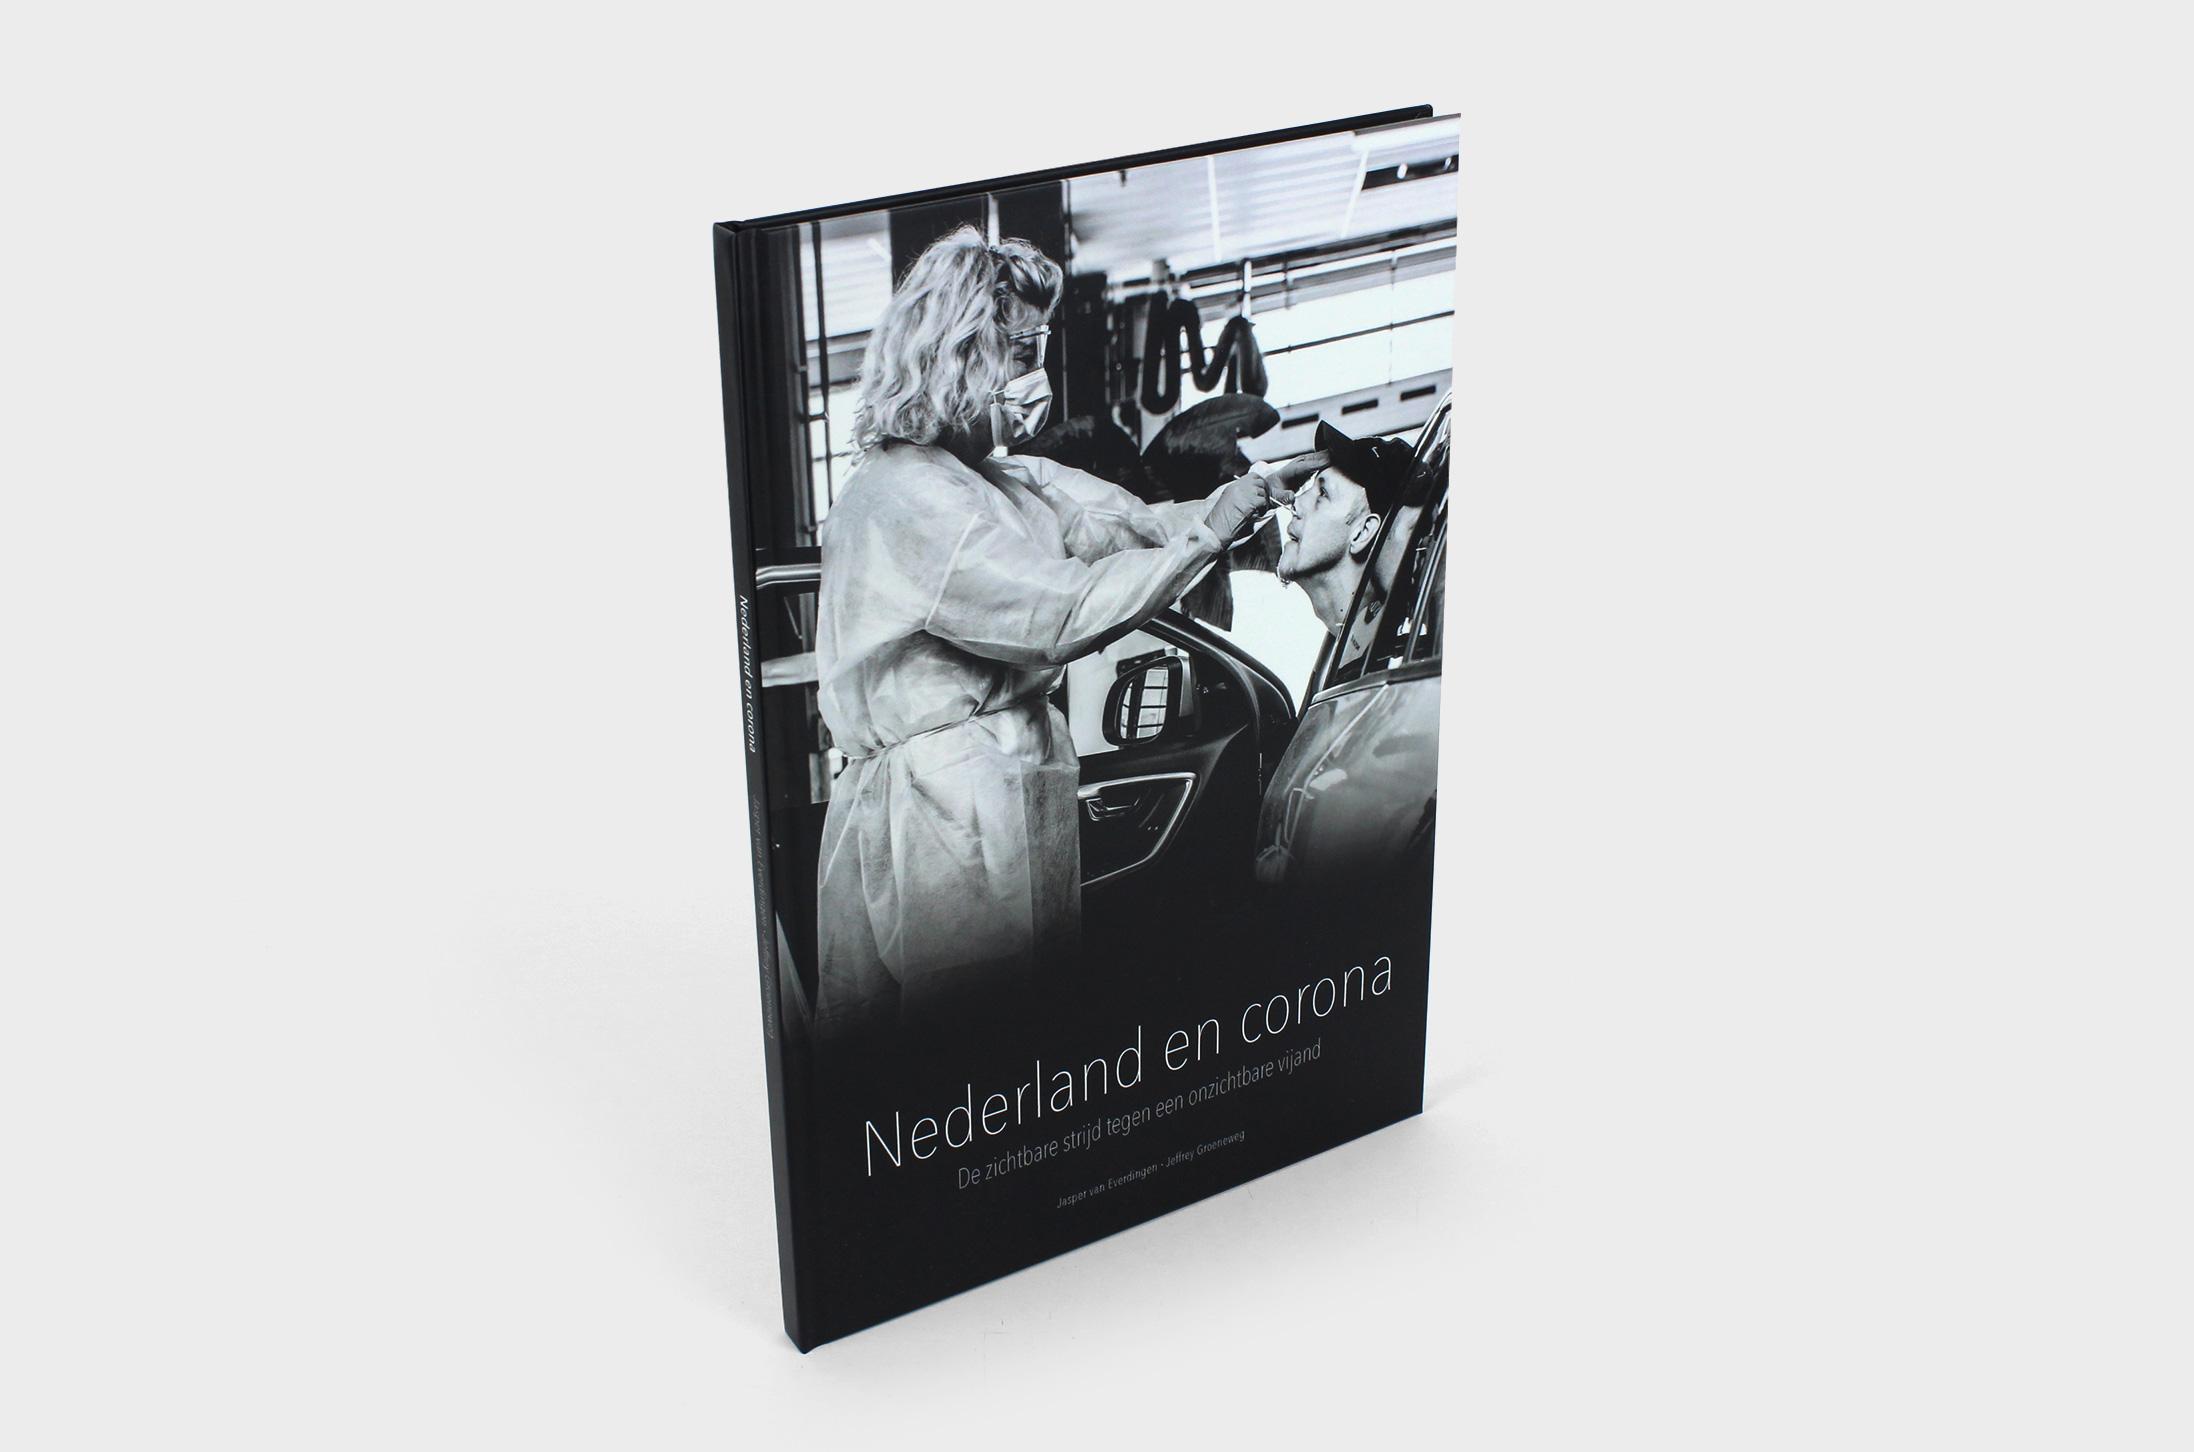 Nederland en corona